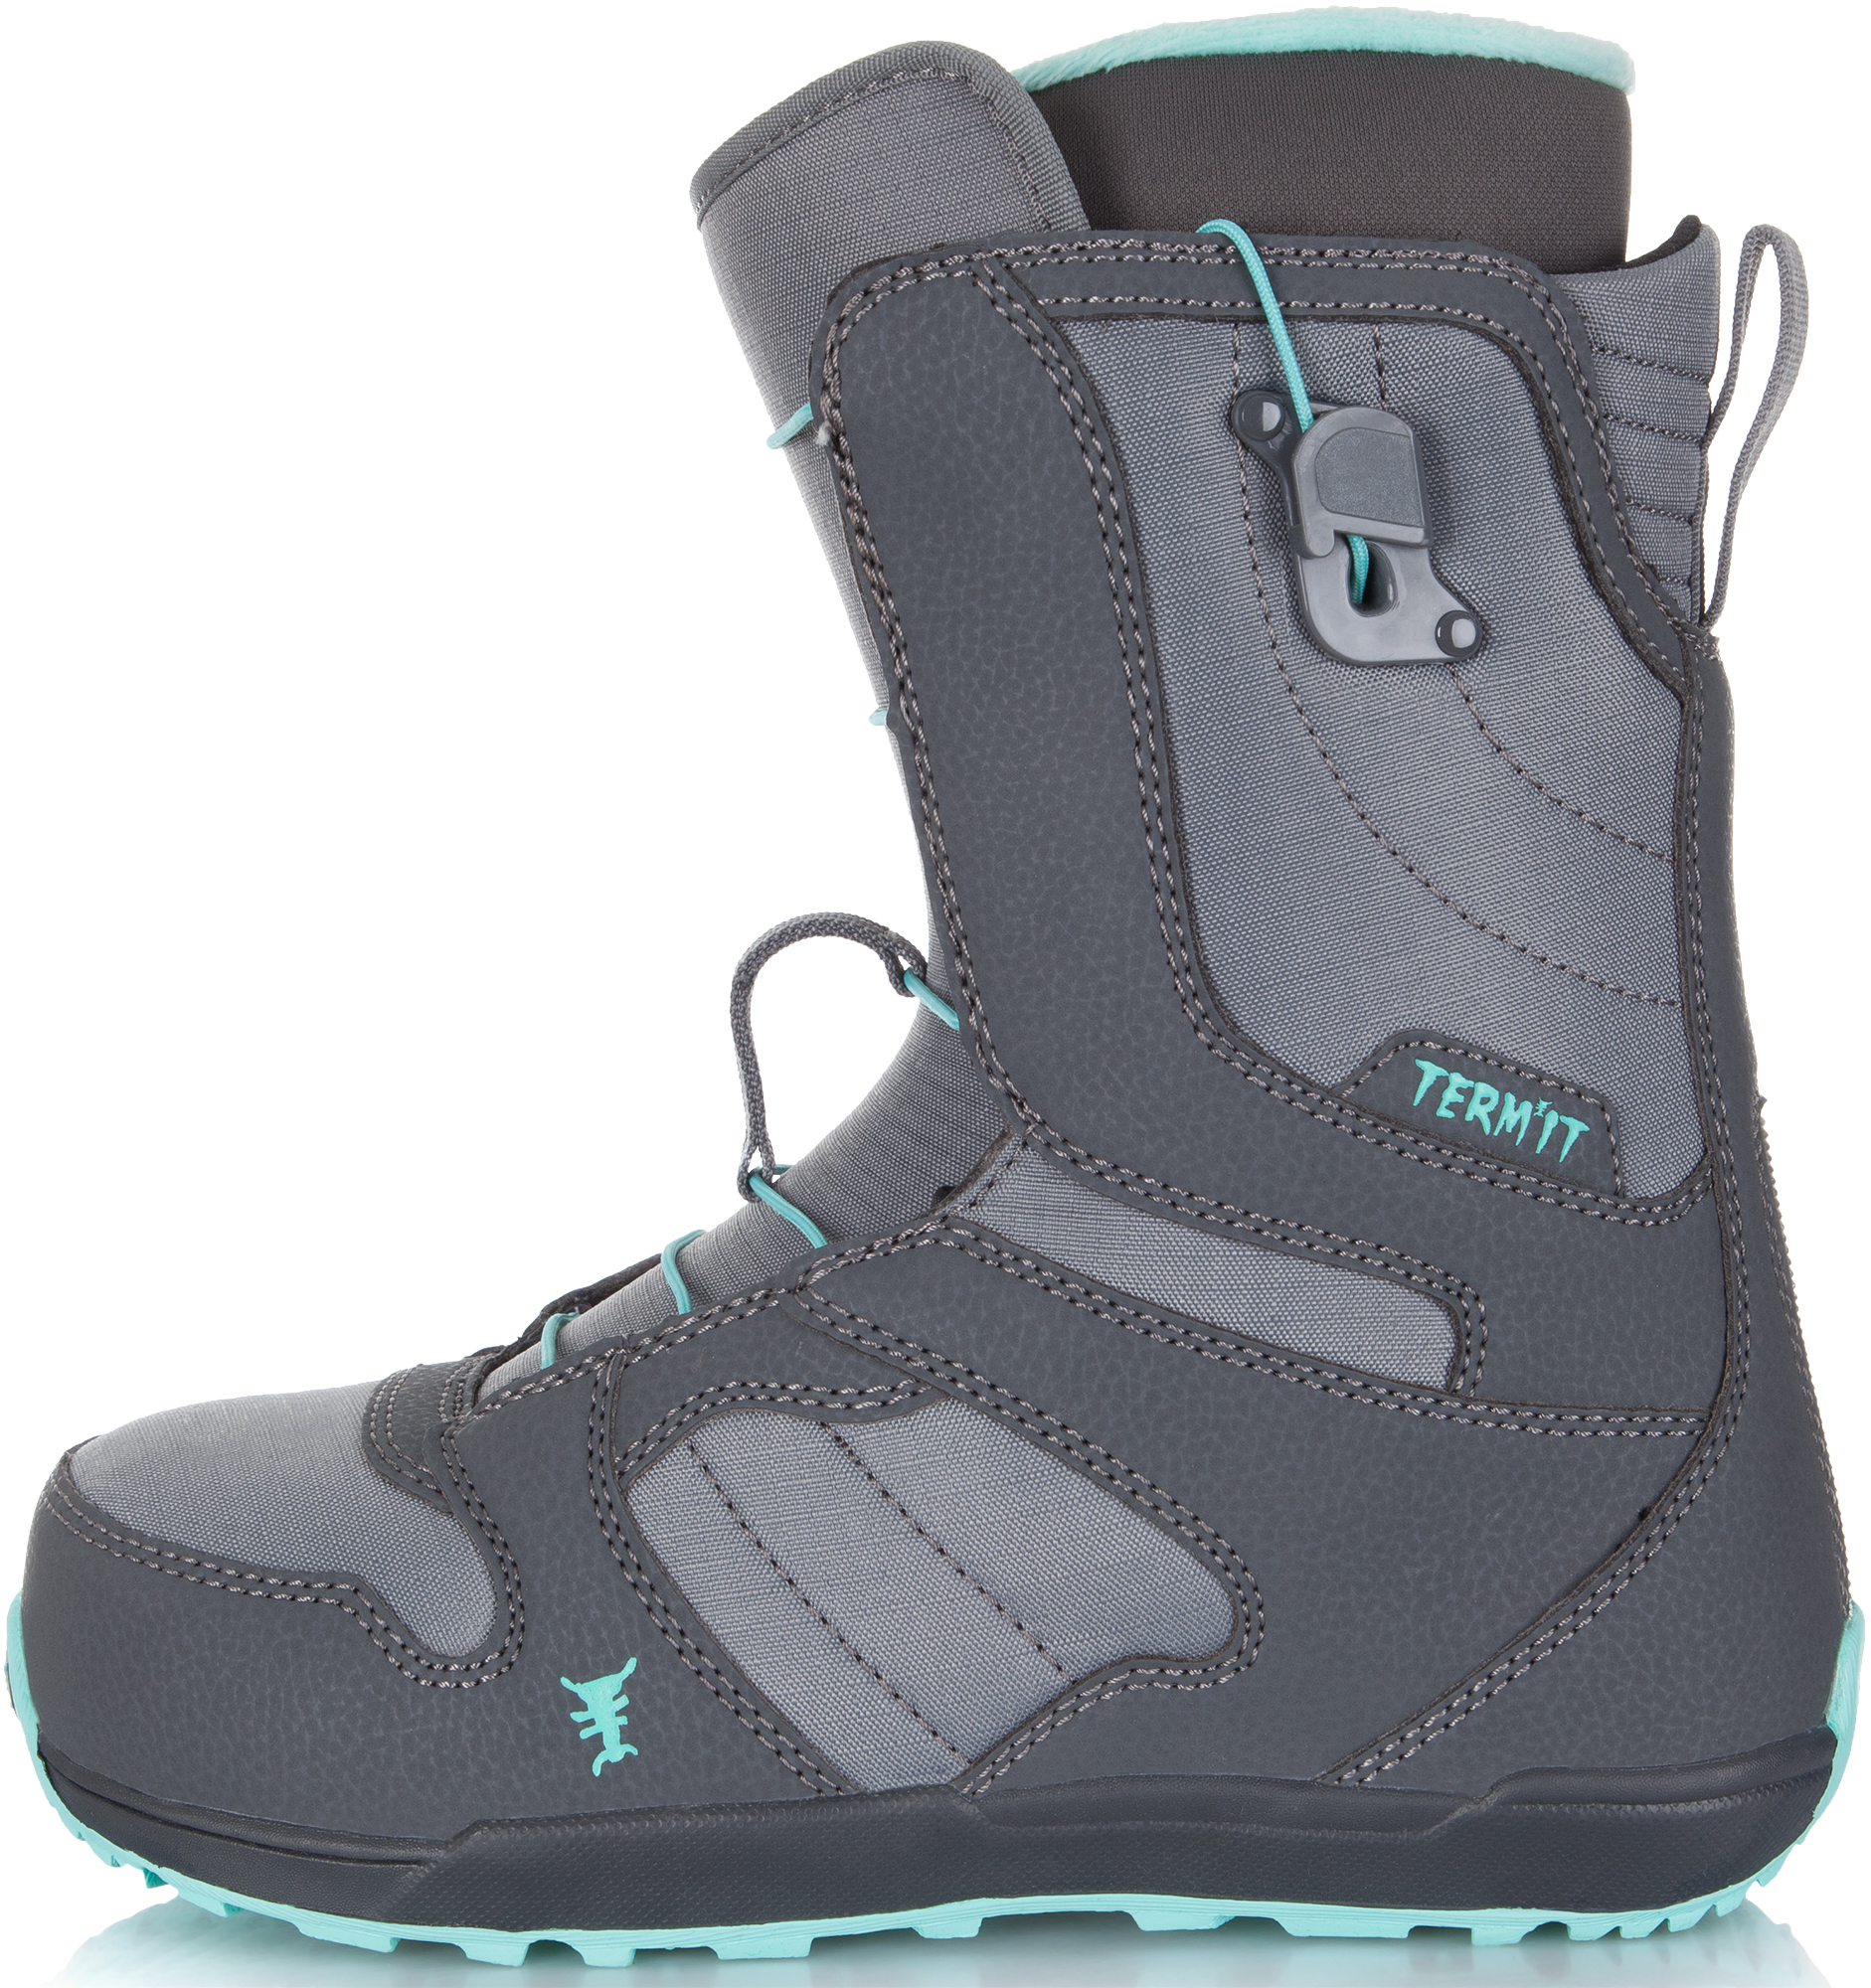 Termit Ботинки сноубордические женские Termit Escape, размер 39,5